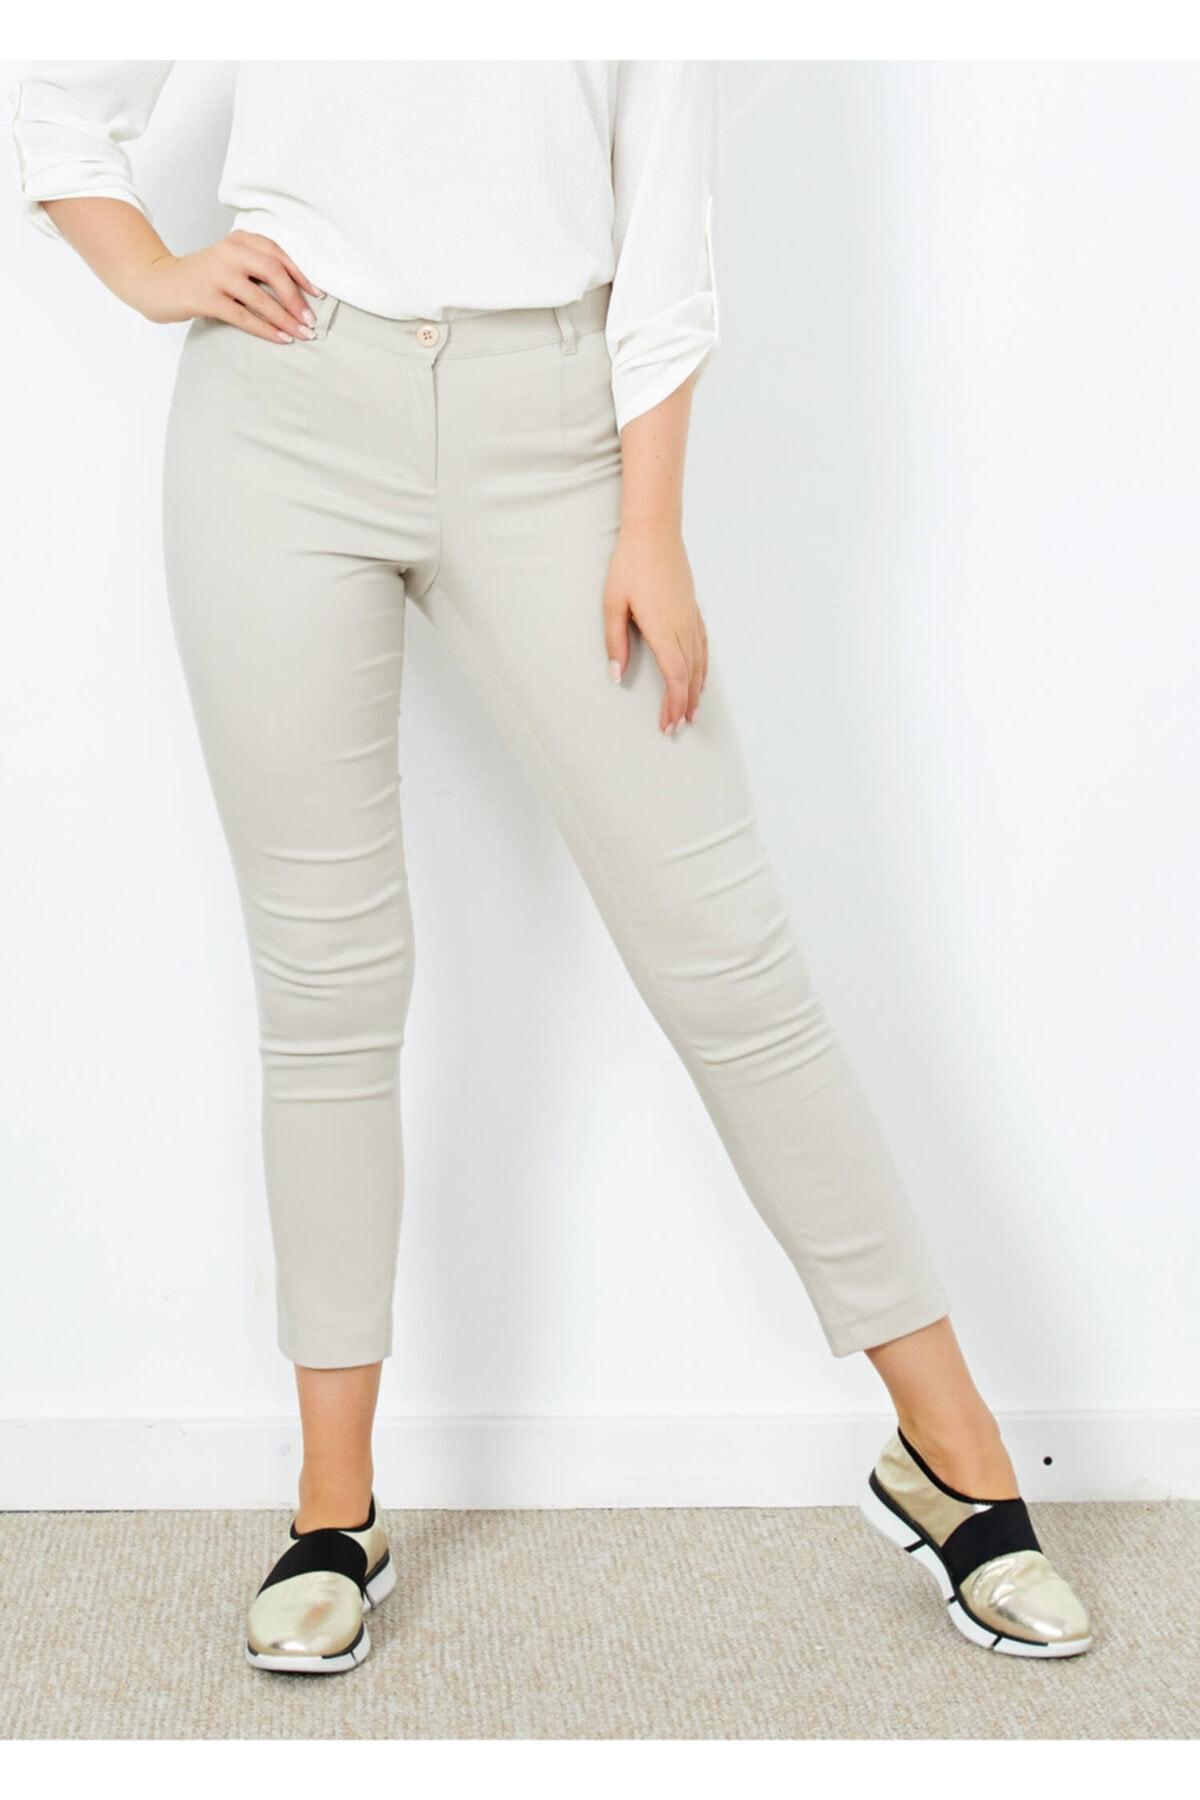 Adze Kadın Taş Klasik Kesim Dar Paça Pantalon 1